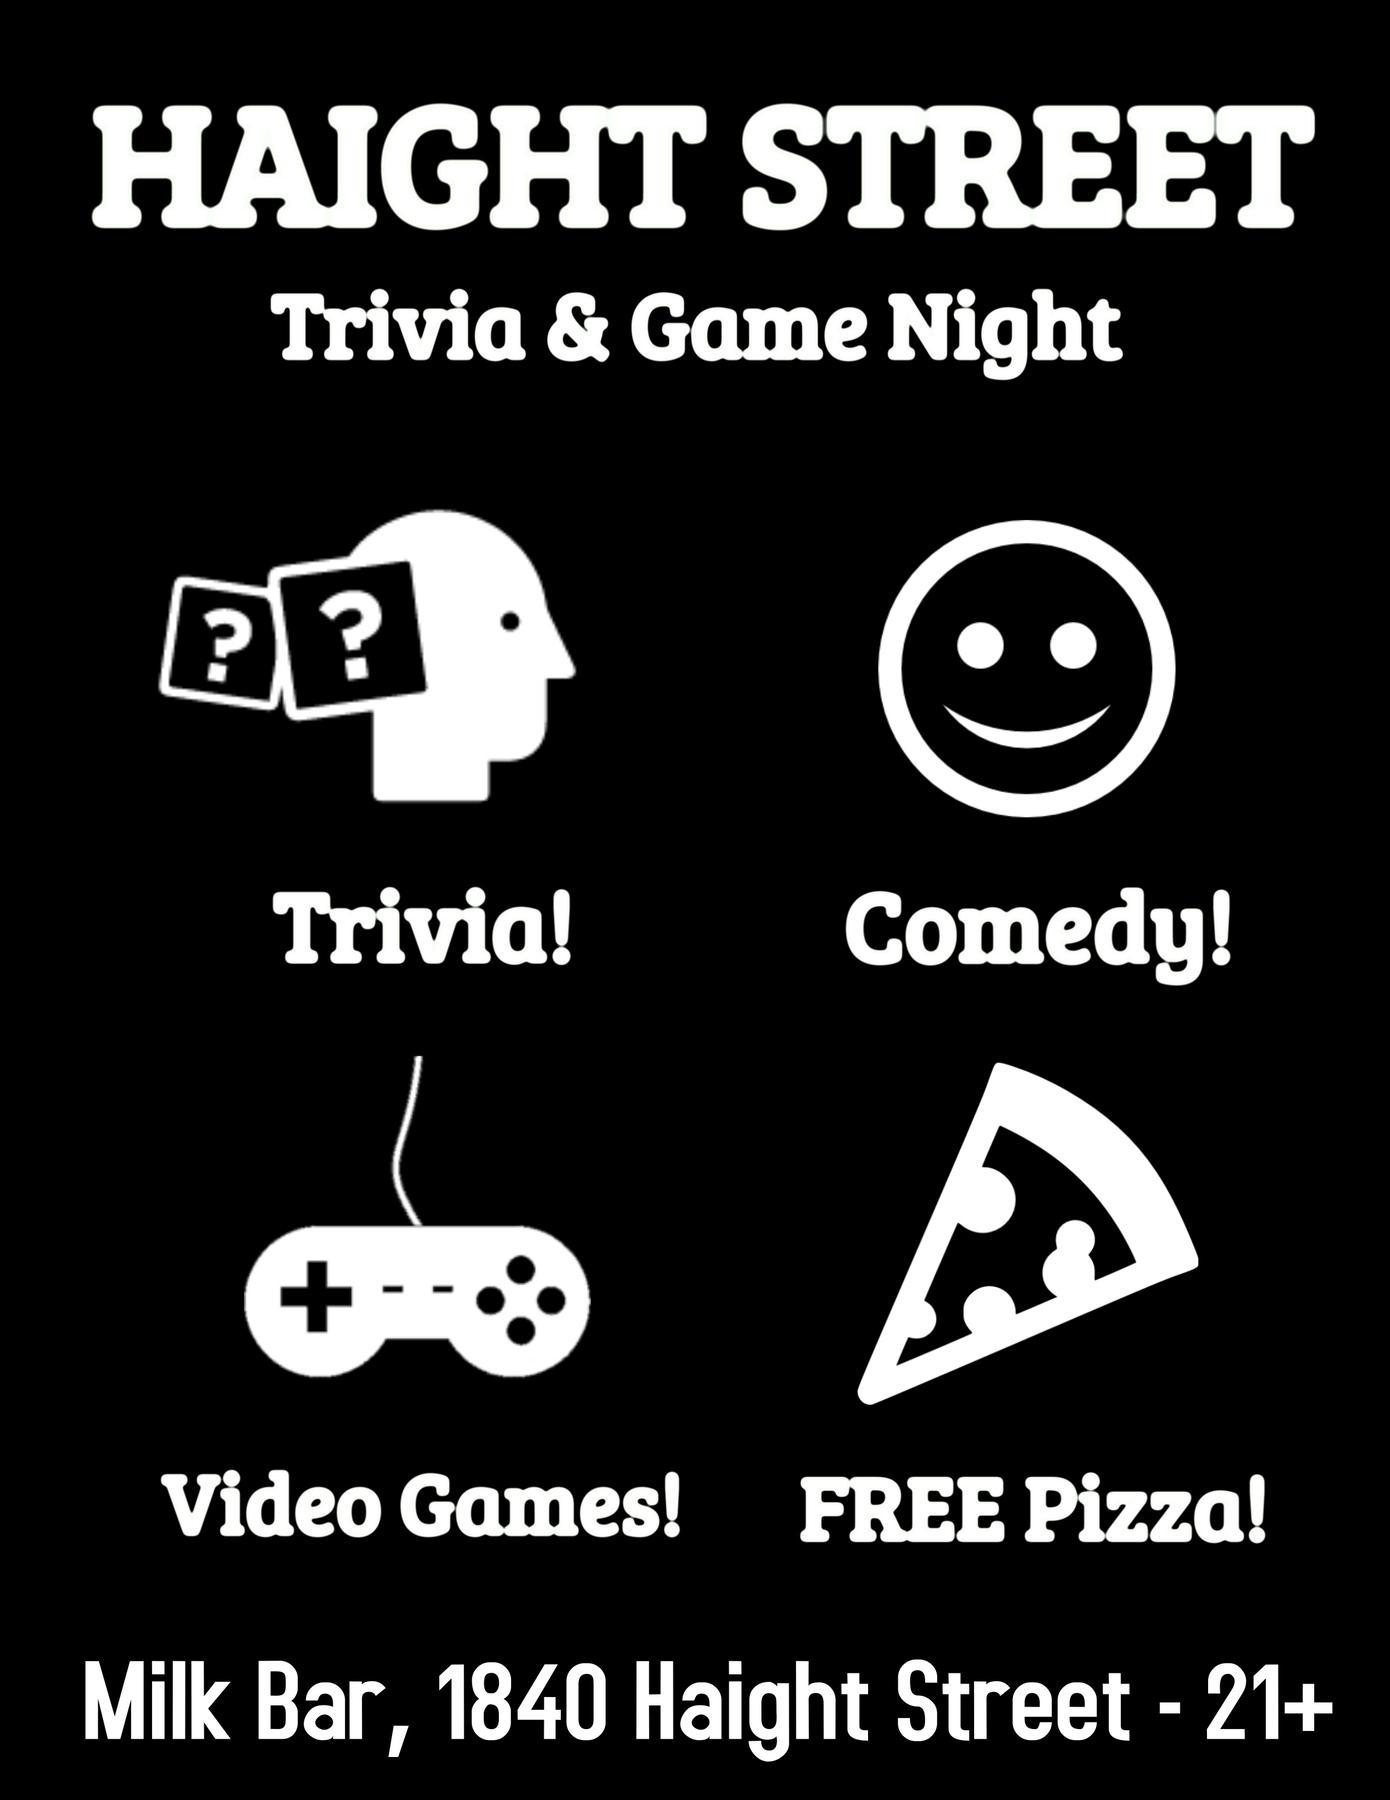 Haight Street Trivia, Comedy, Gaming & FREE P